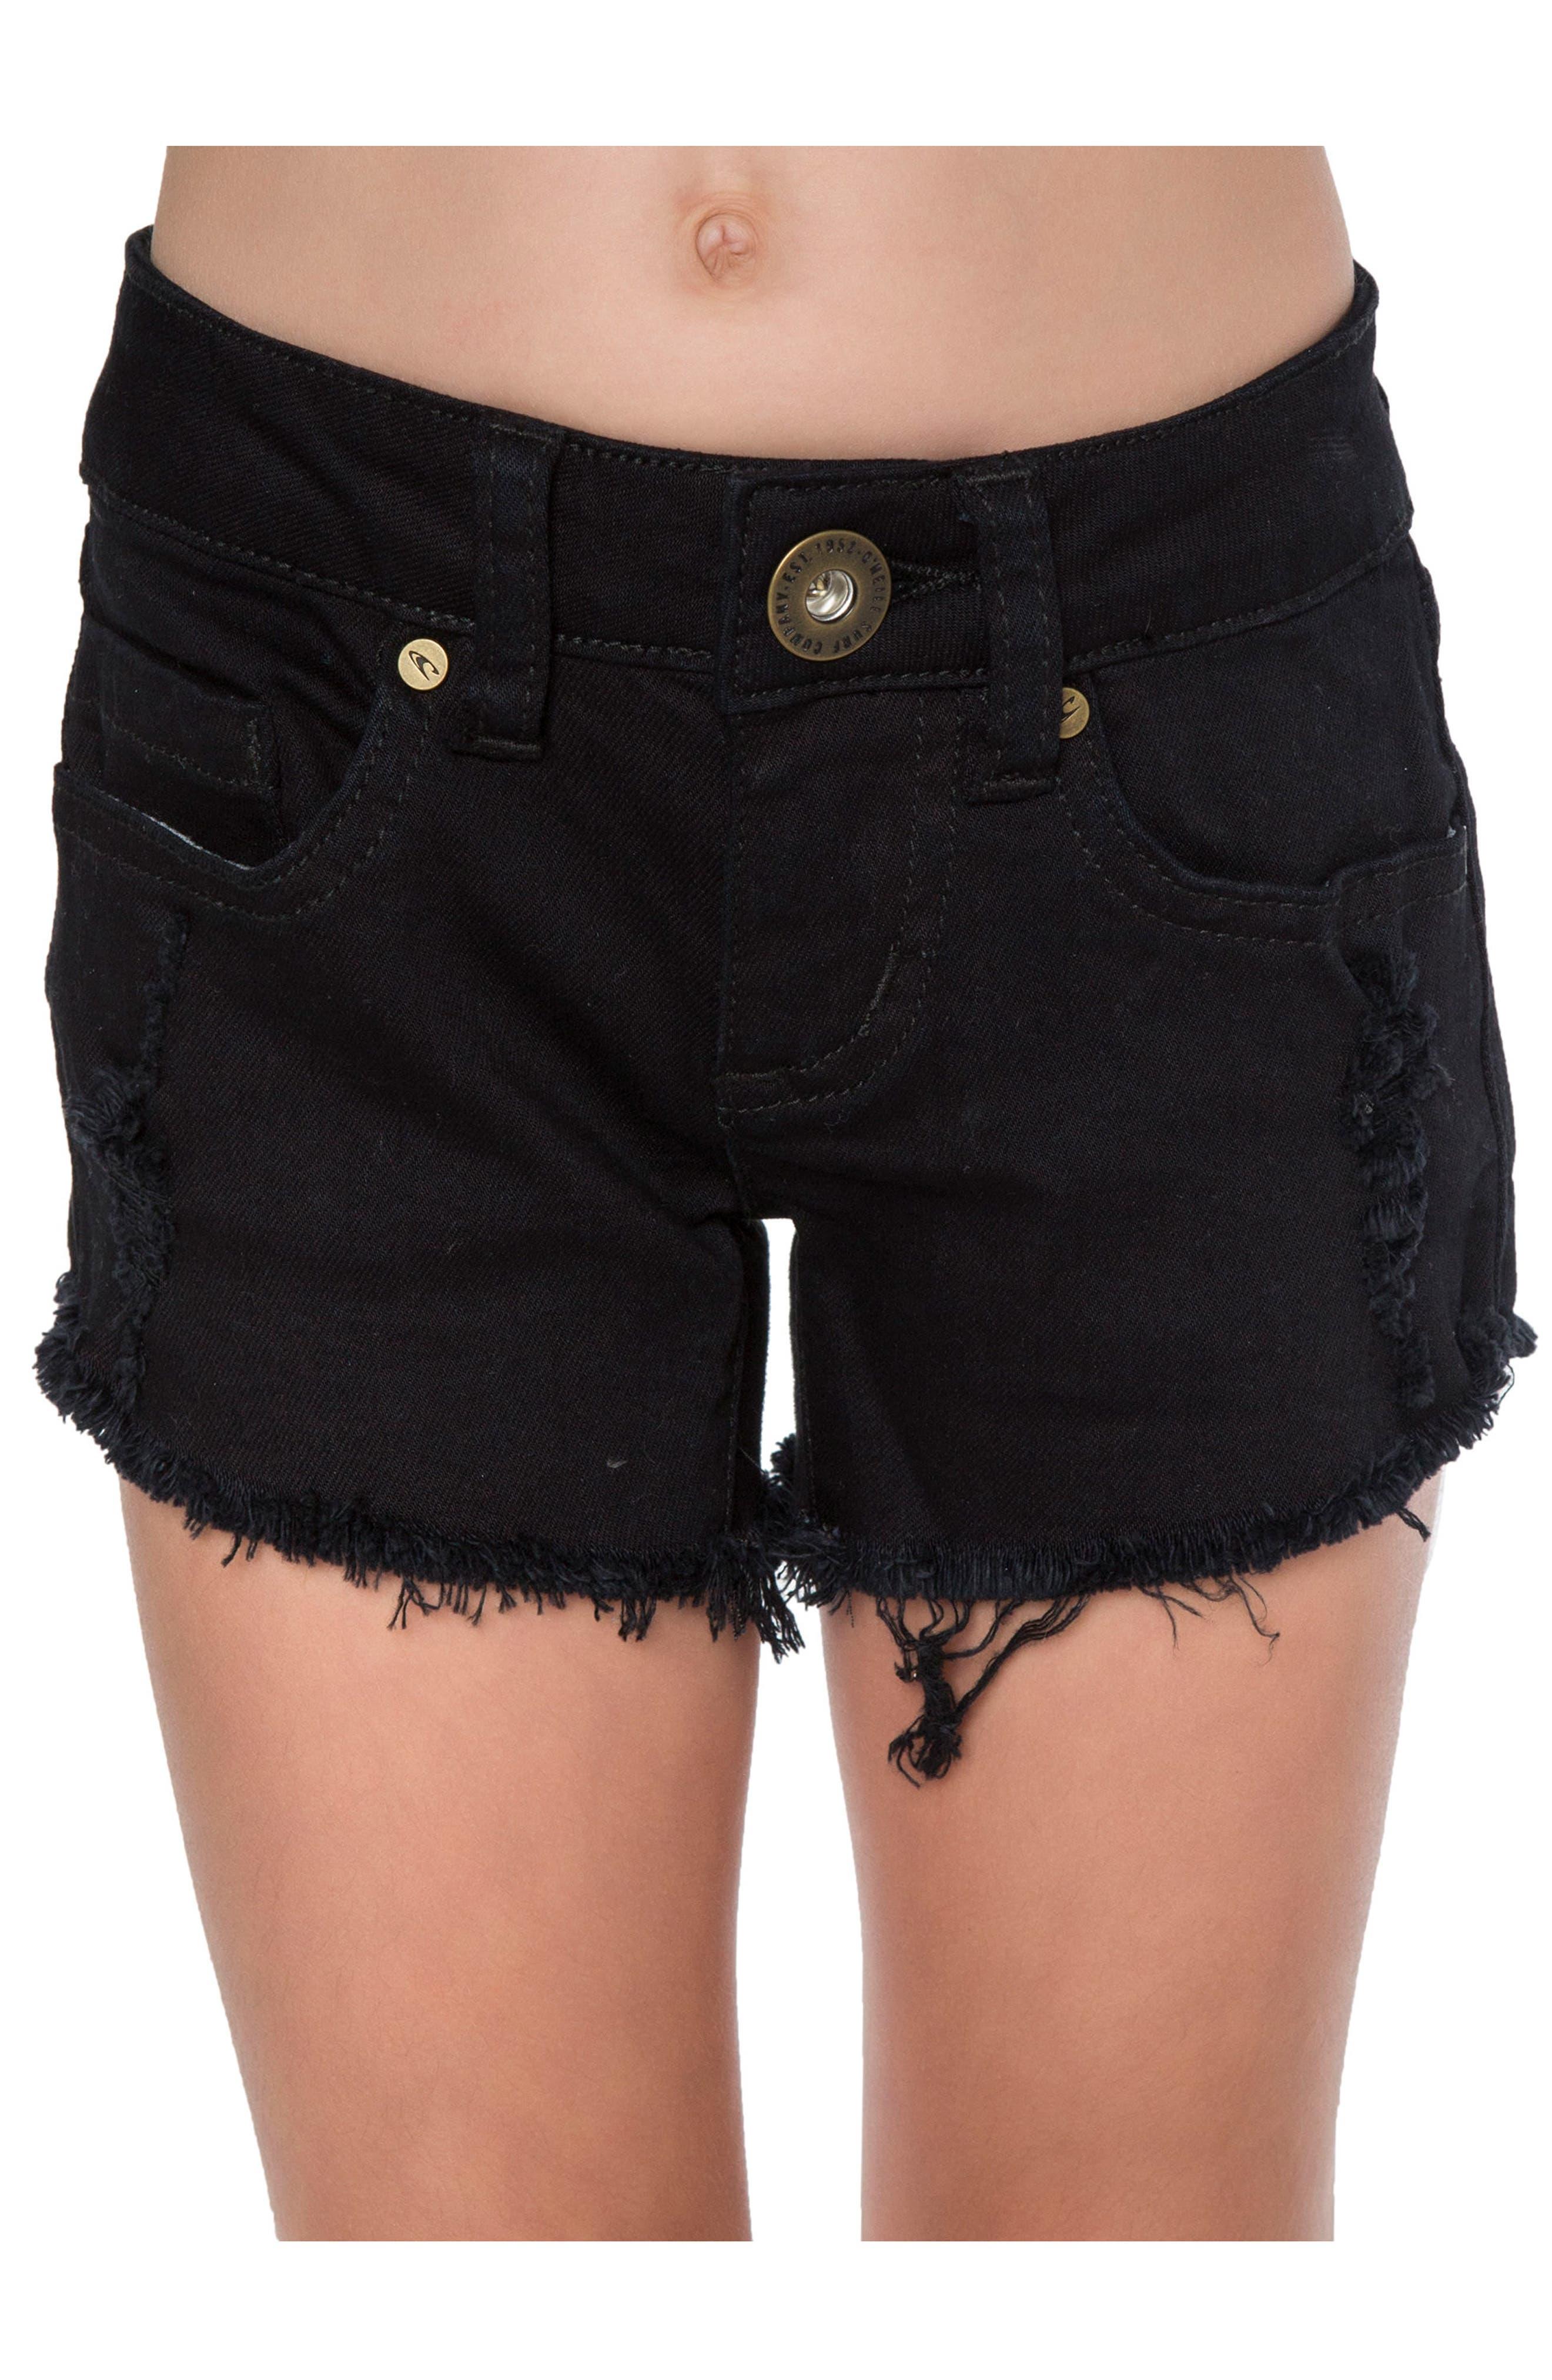 Compass Cutoff Shorts,                         Main,                         color, Black